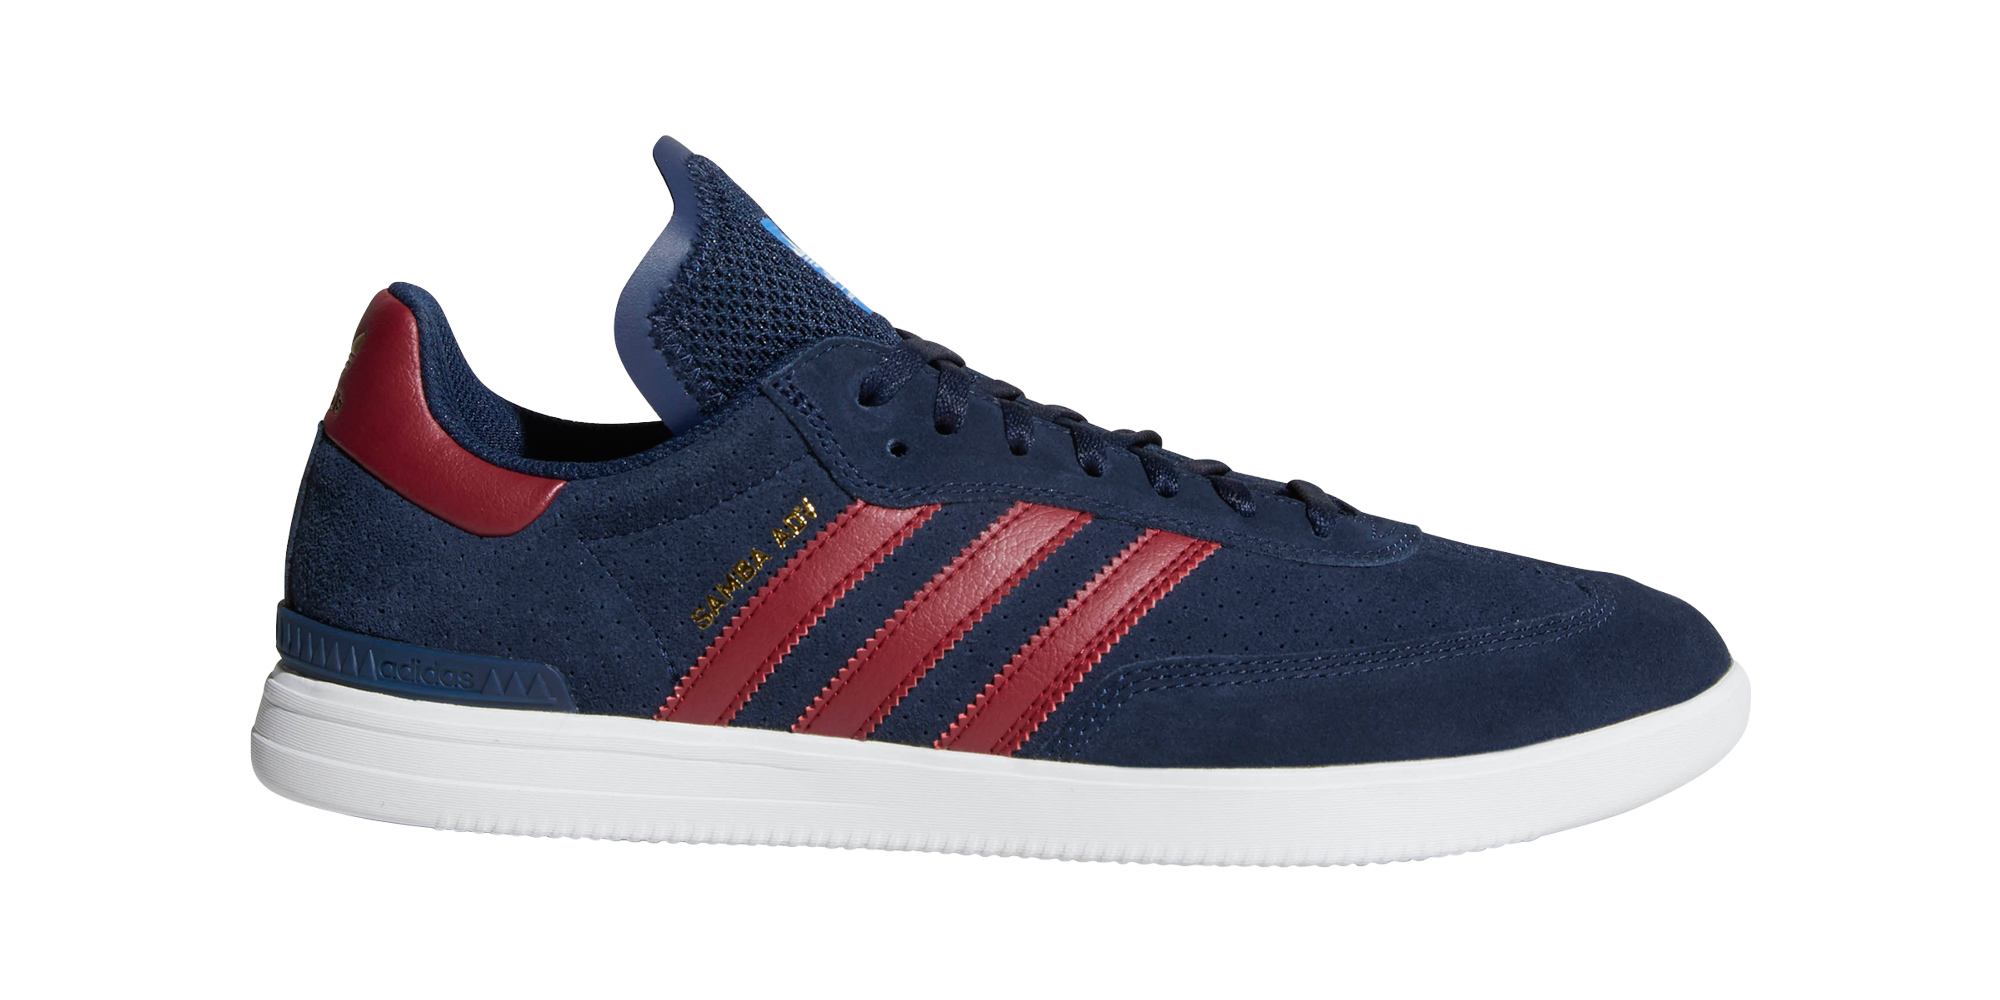 Adidas Samba ADV Skate Shoes  2b6c4a91a5dc